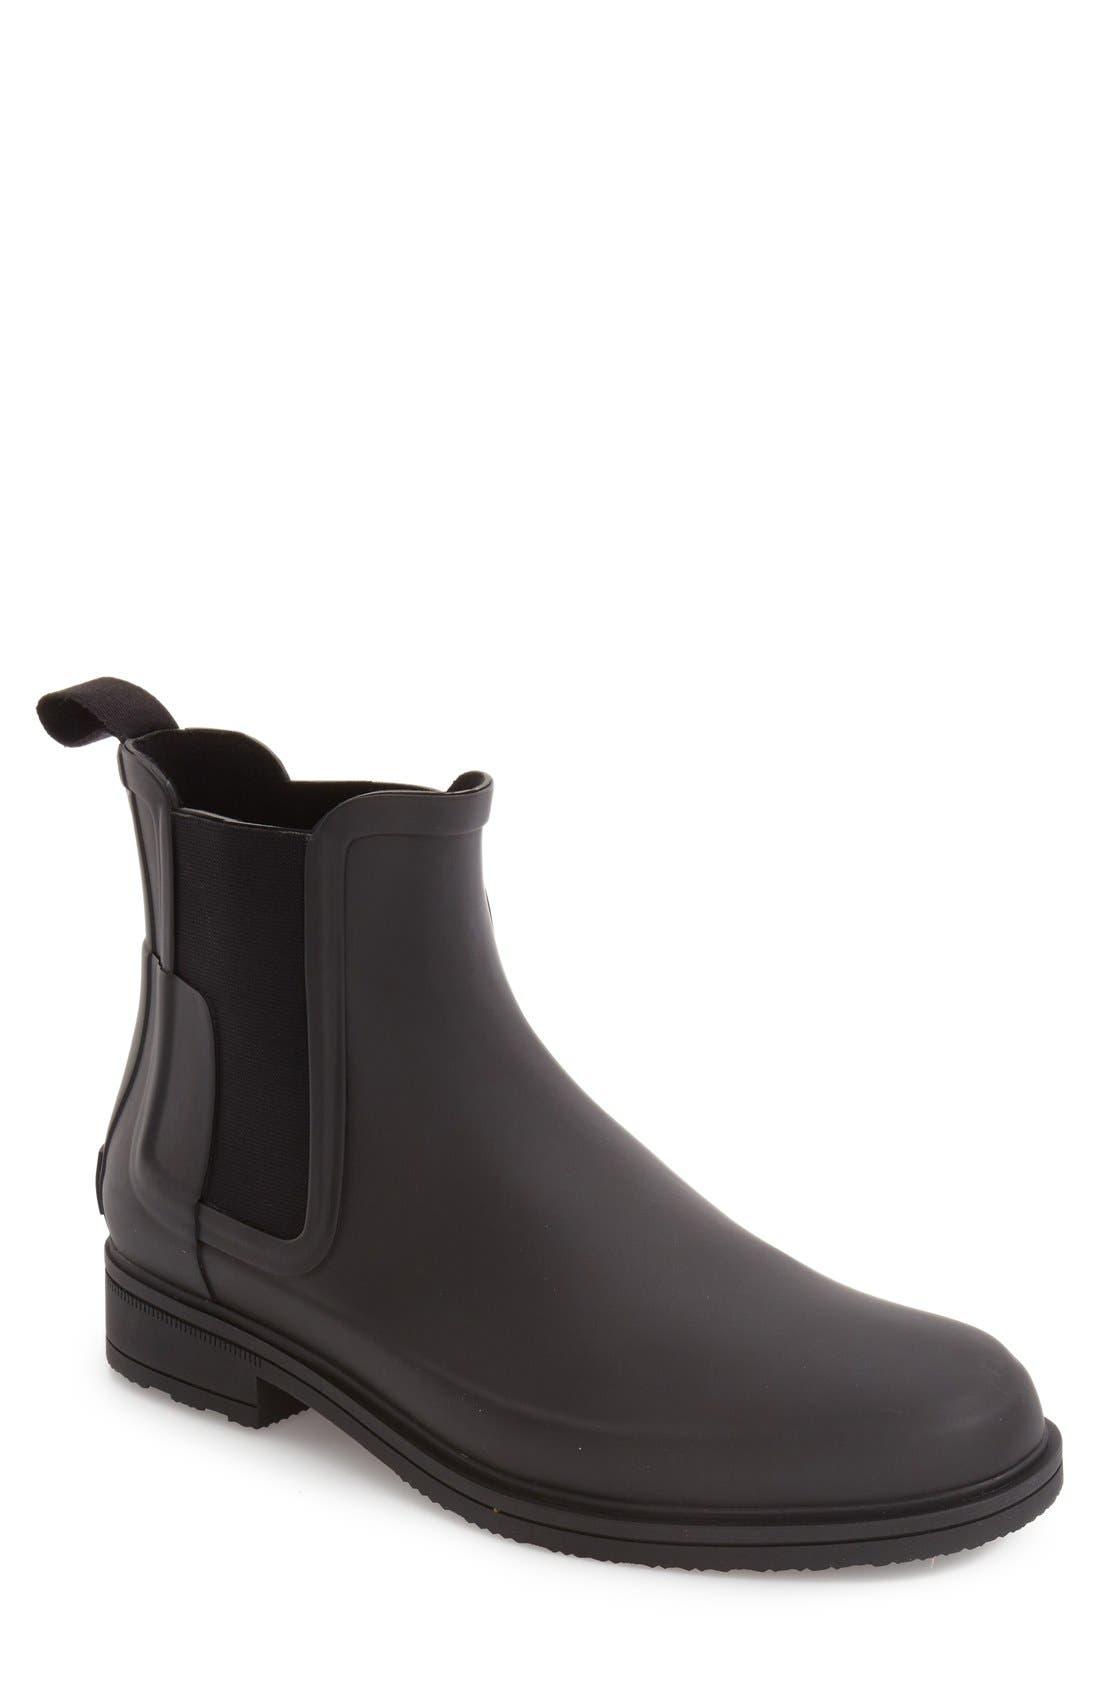 Hunter Original Refined Waterproof Chelsea Boot, Black